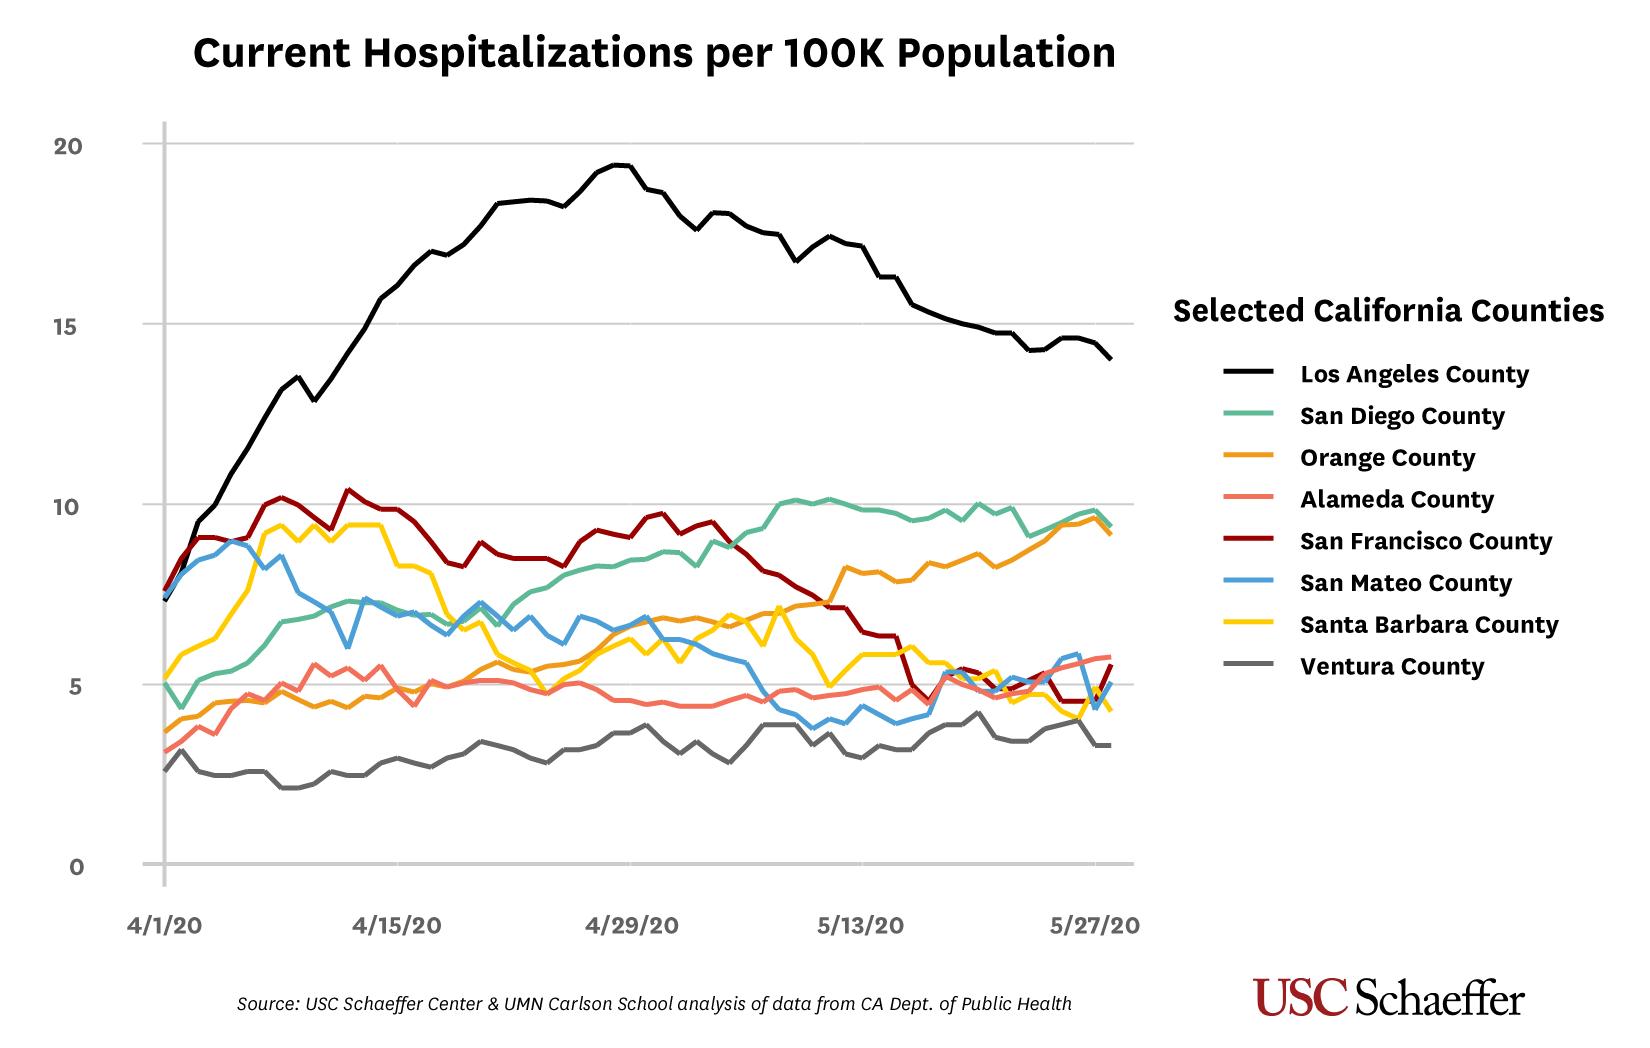 L A County Coronavirus Hospitalizations Trending Down Other Urban California Counties Show Mixed Progress Usc Schaeffer